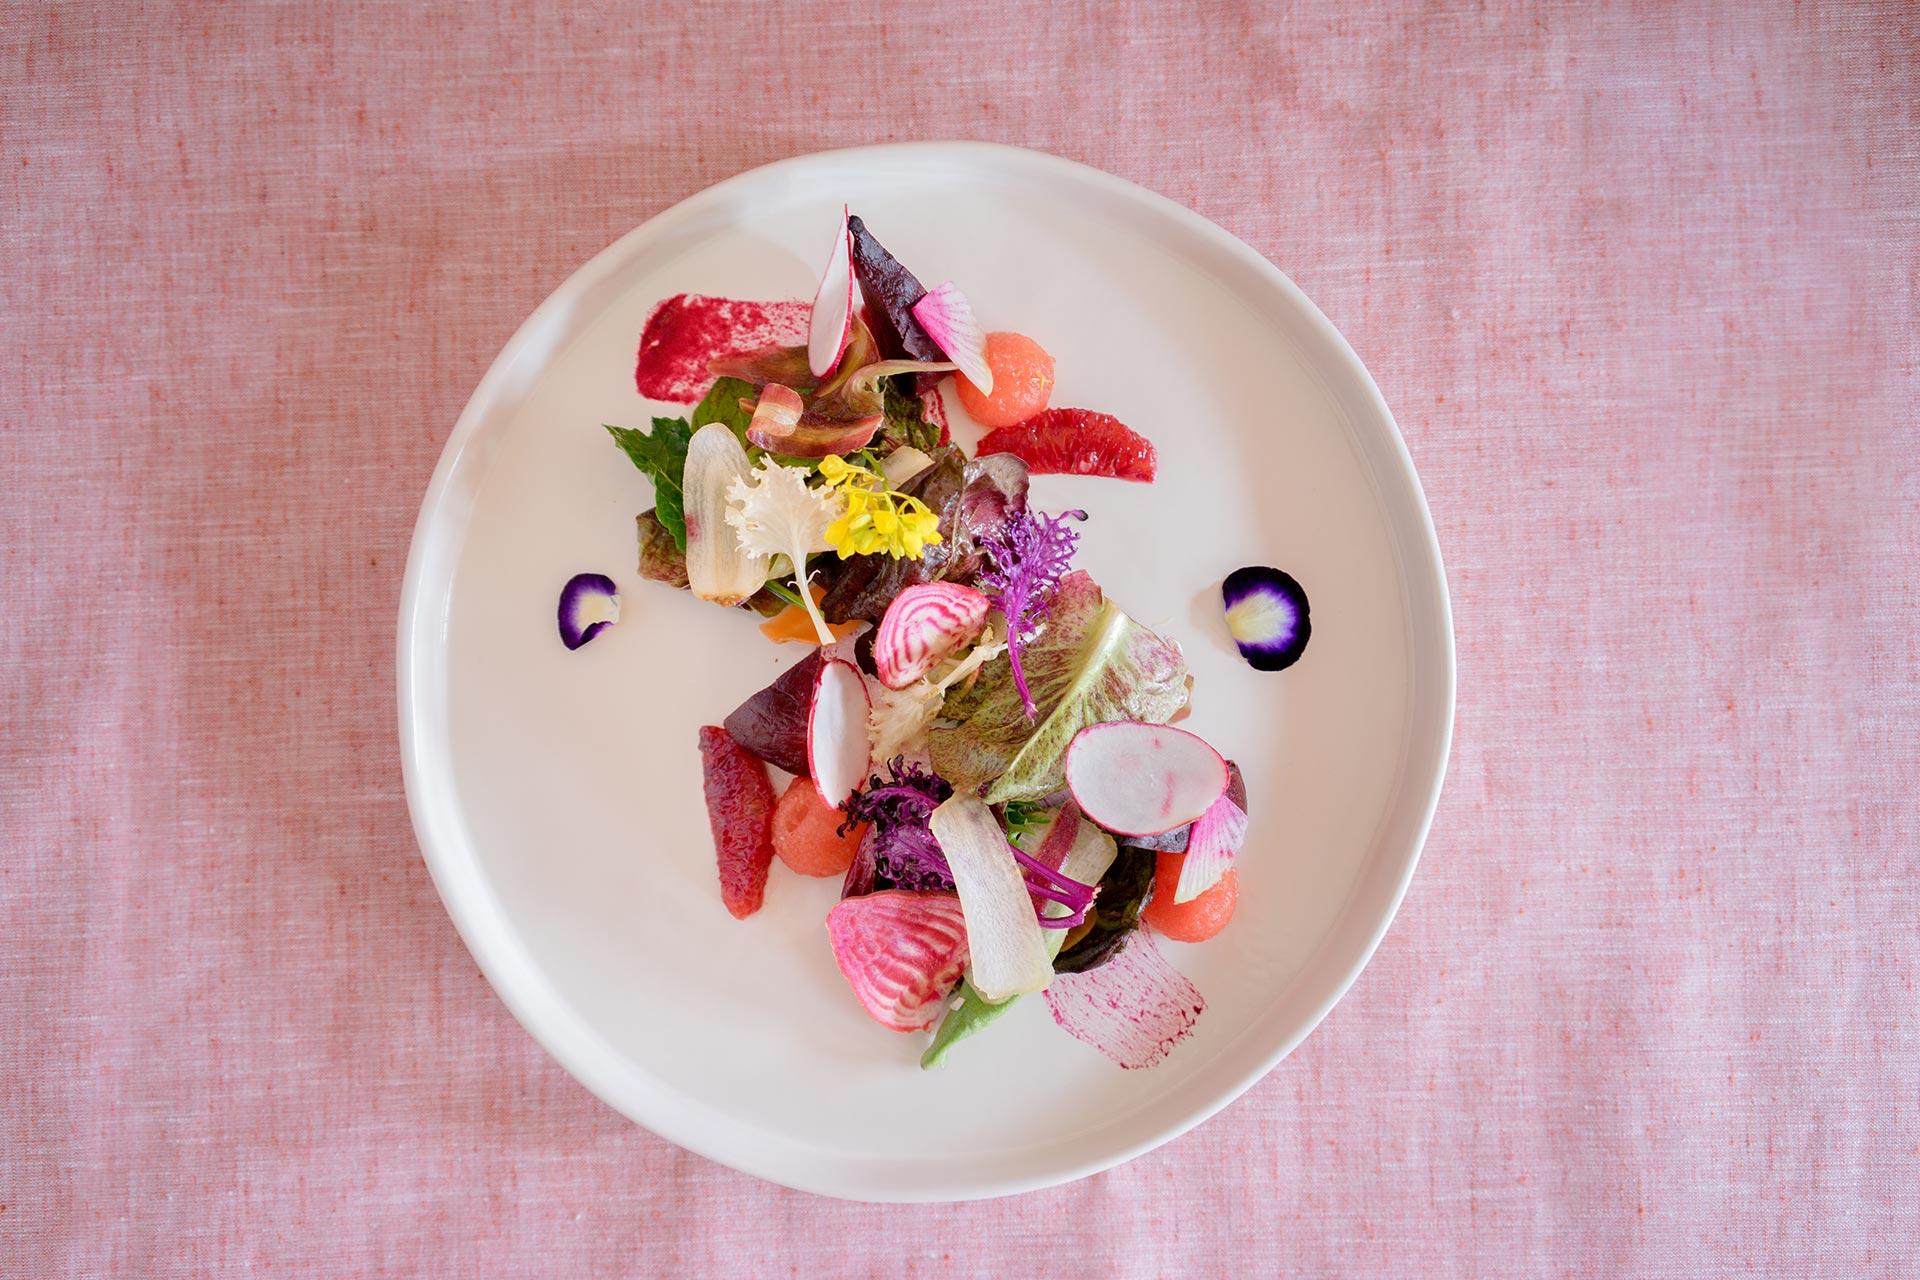 keeva-sf-restaurant-food-photographer-a-few-good-clicks-40.jpg